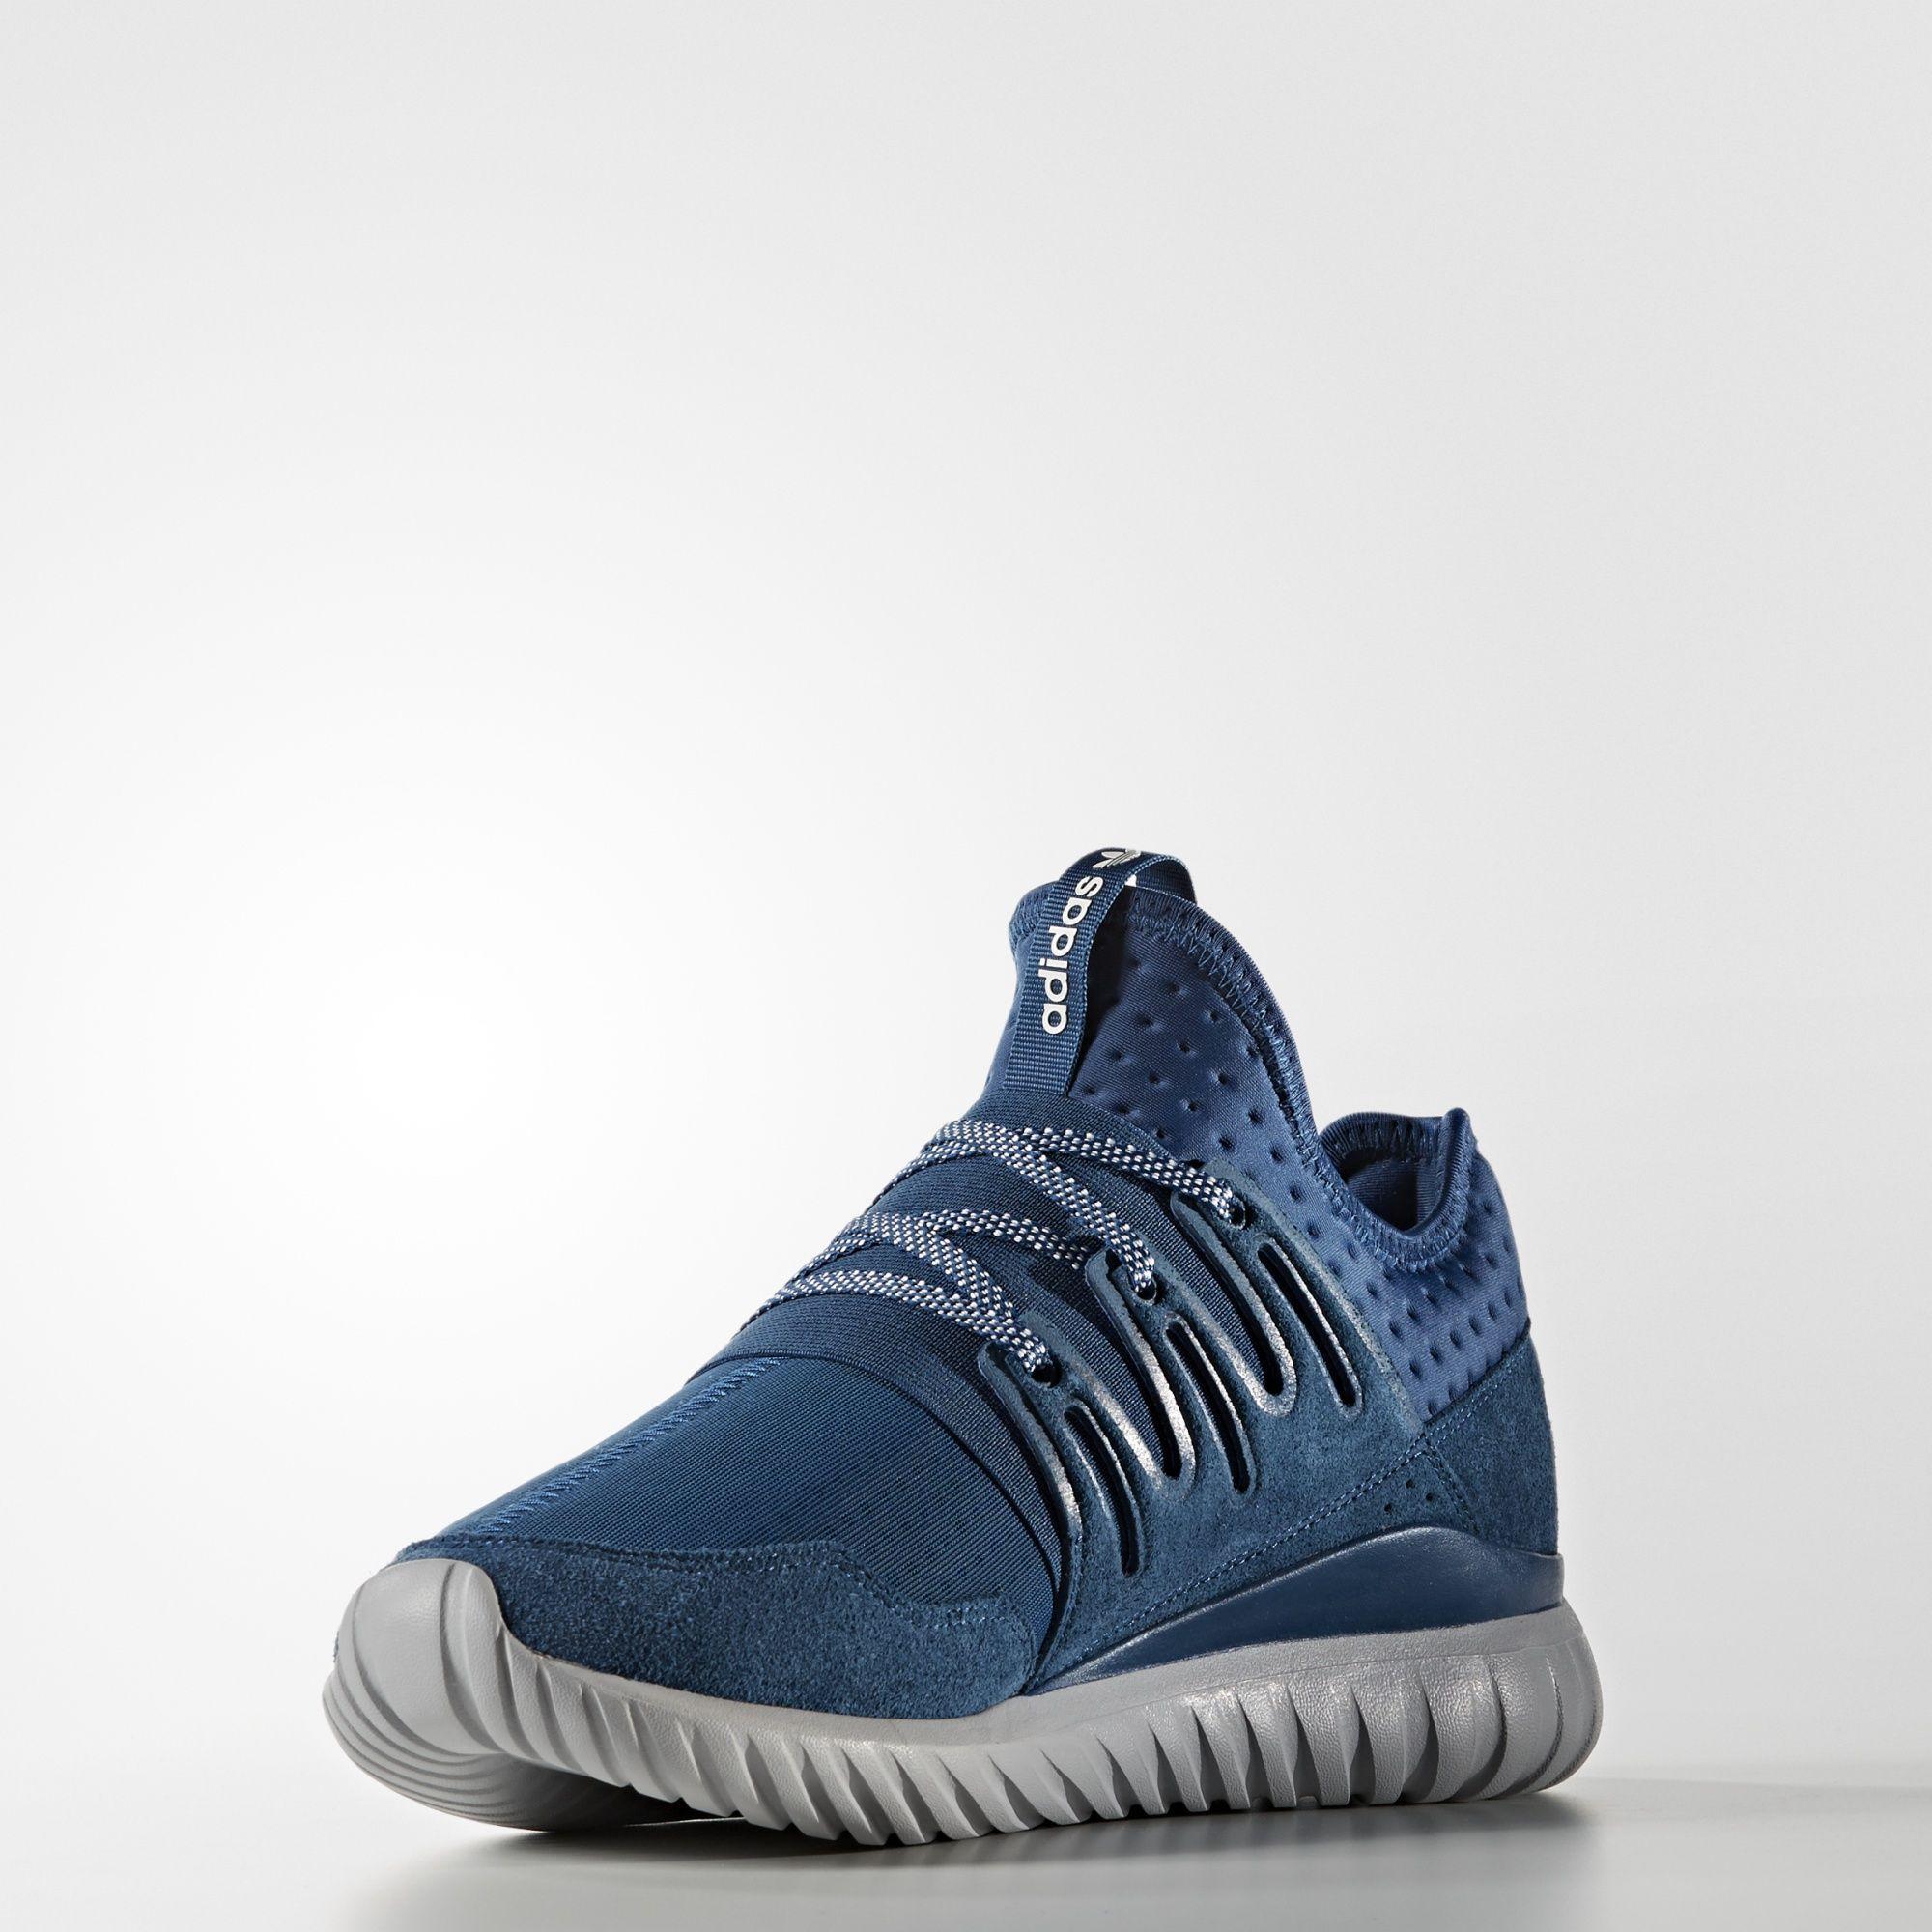 adidas - Men's Tubular Radial Shoes